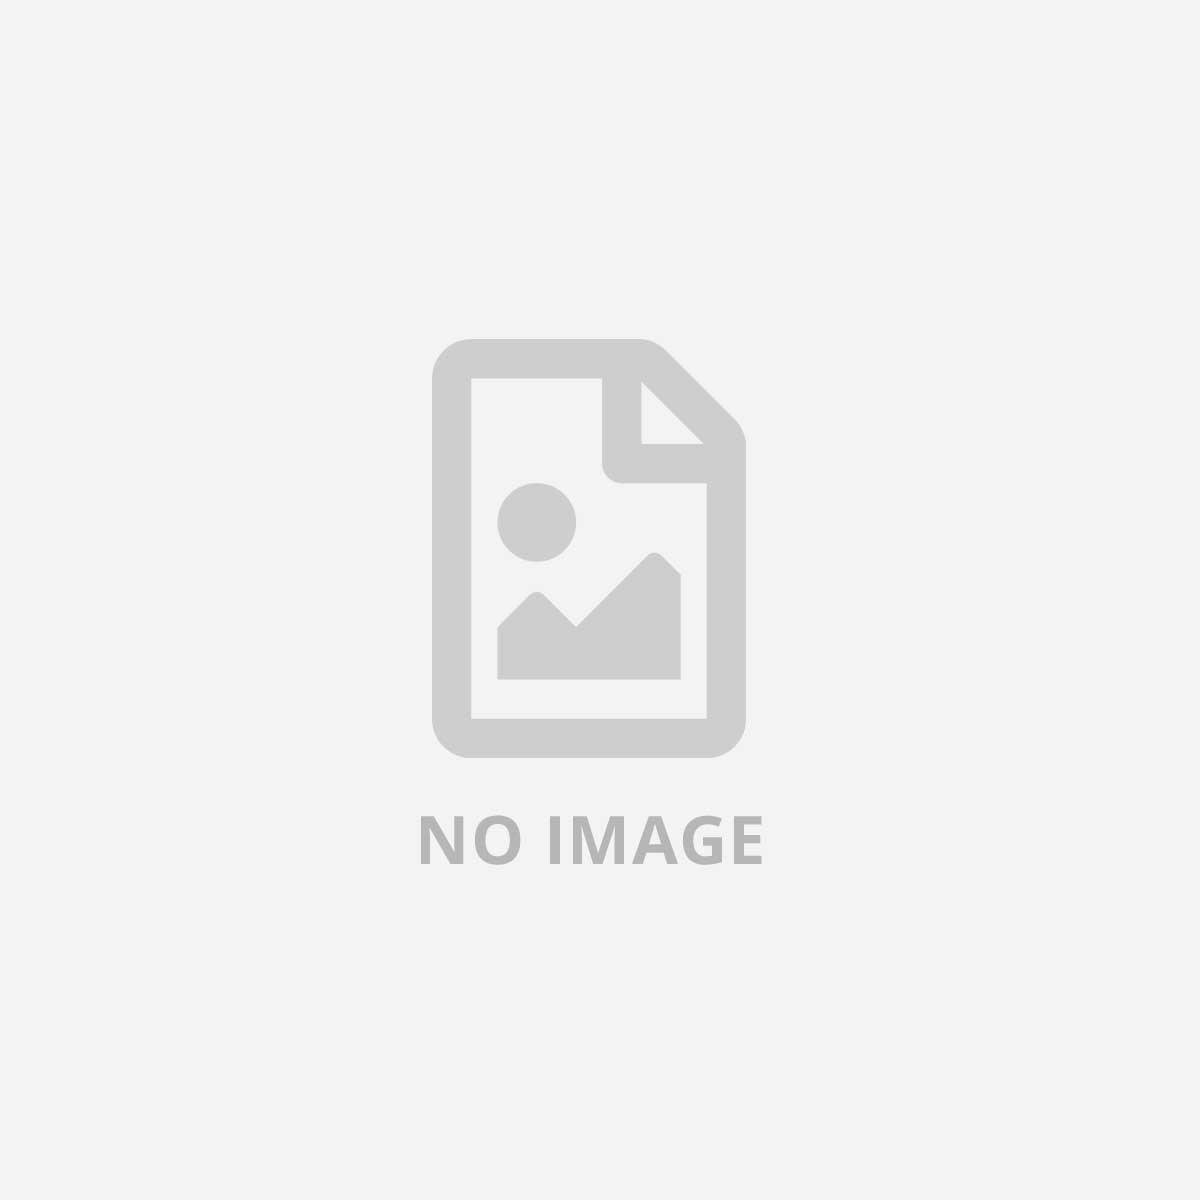 CANON PIXMA TS3350 EUR BLACK